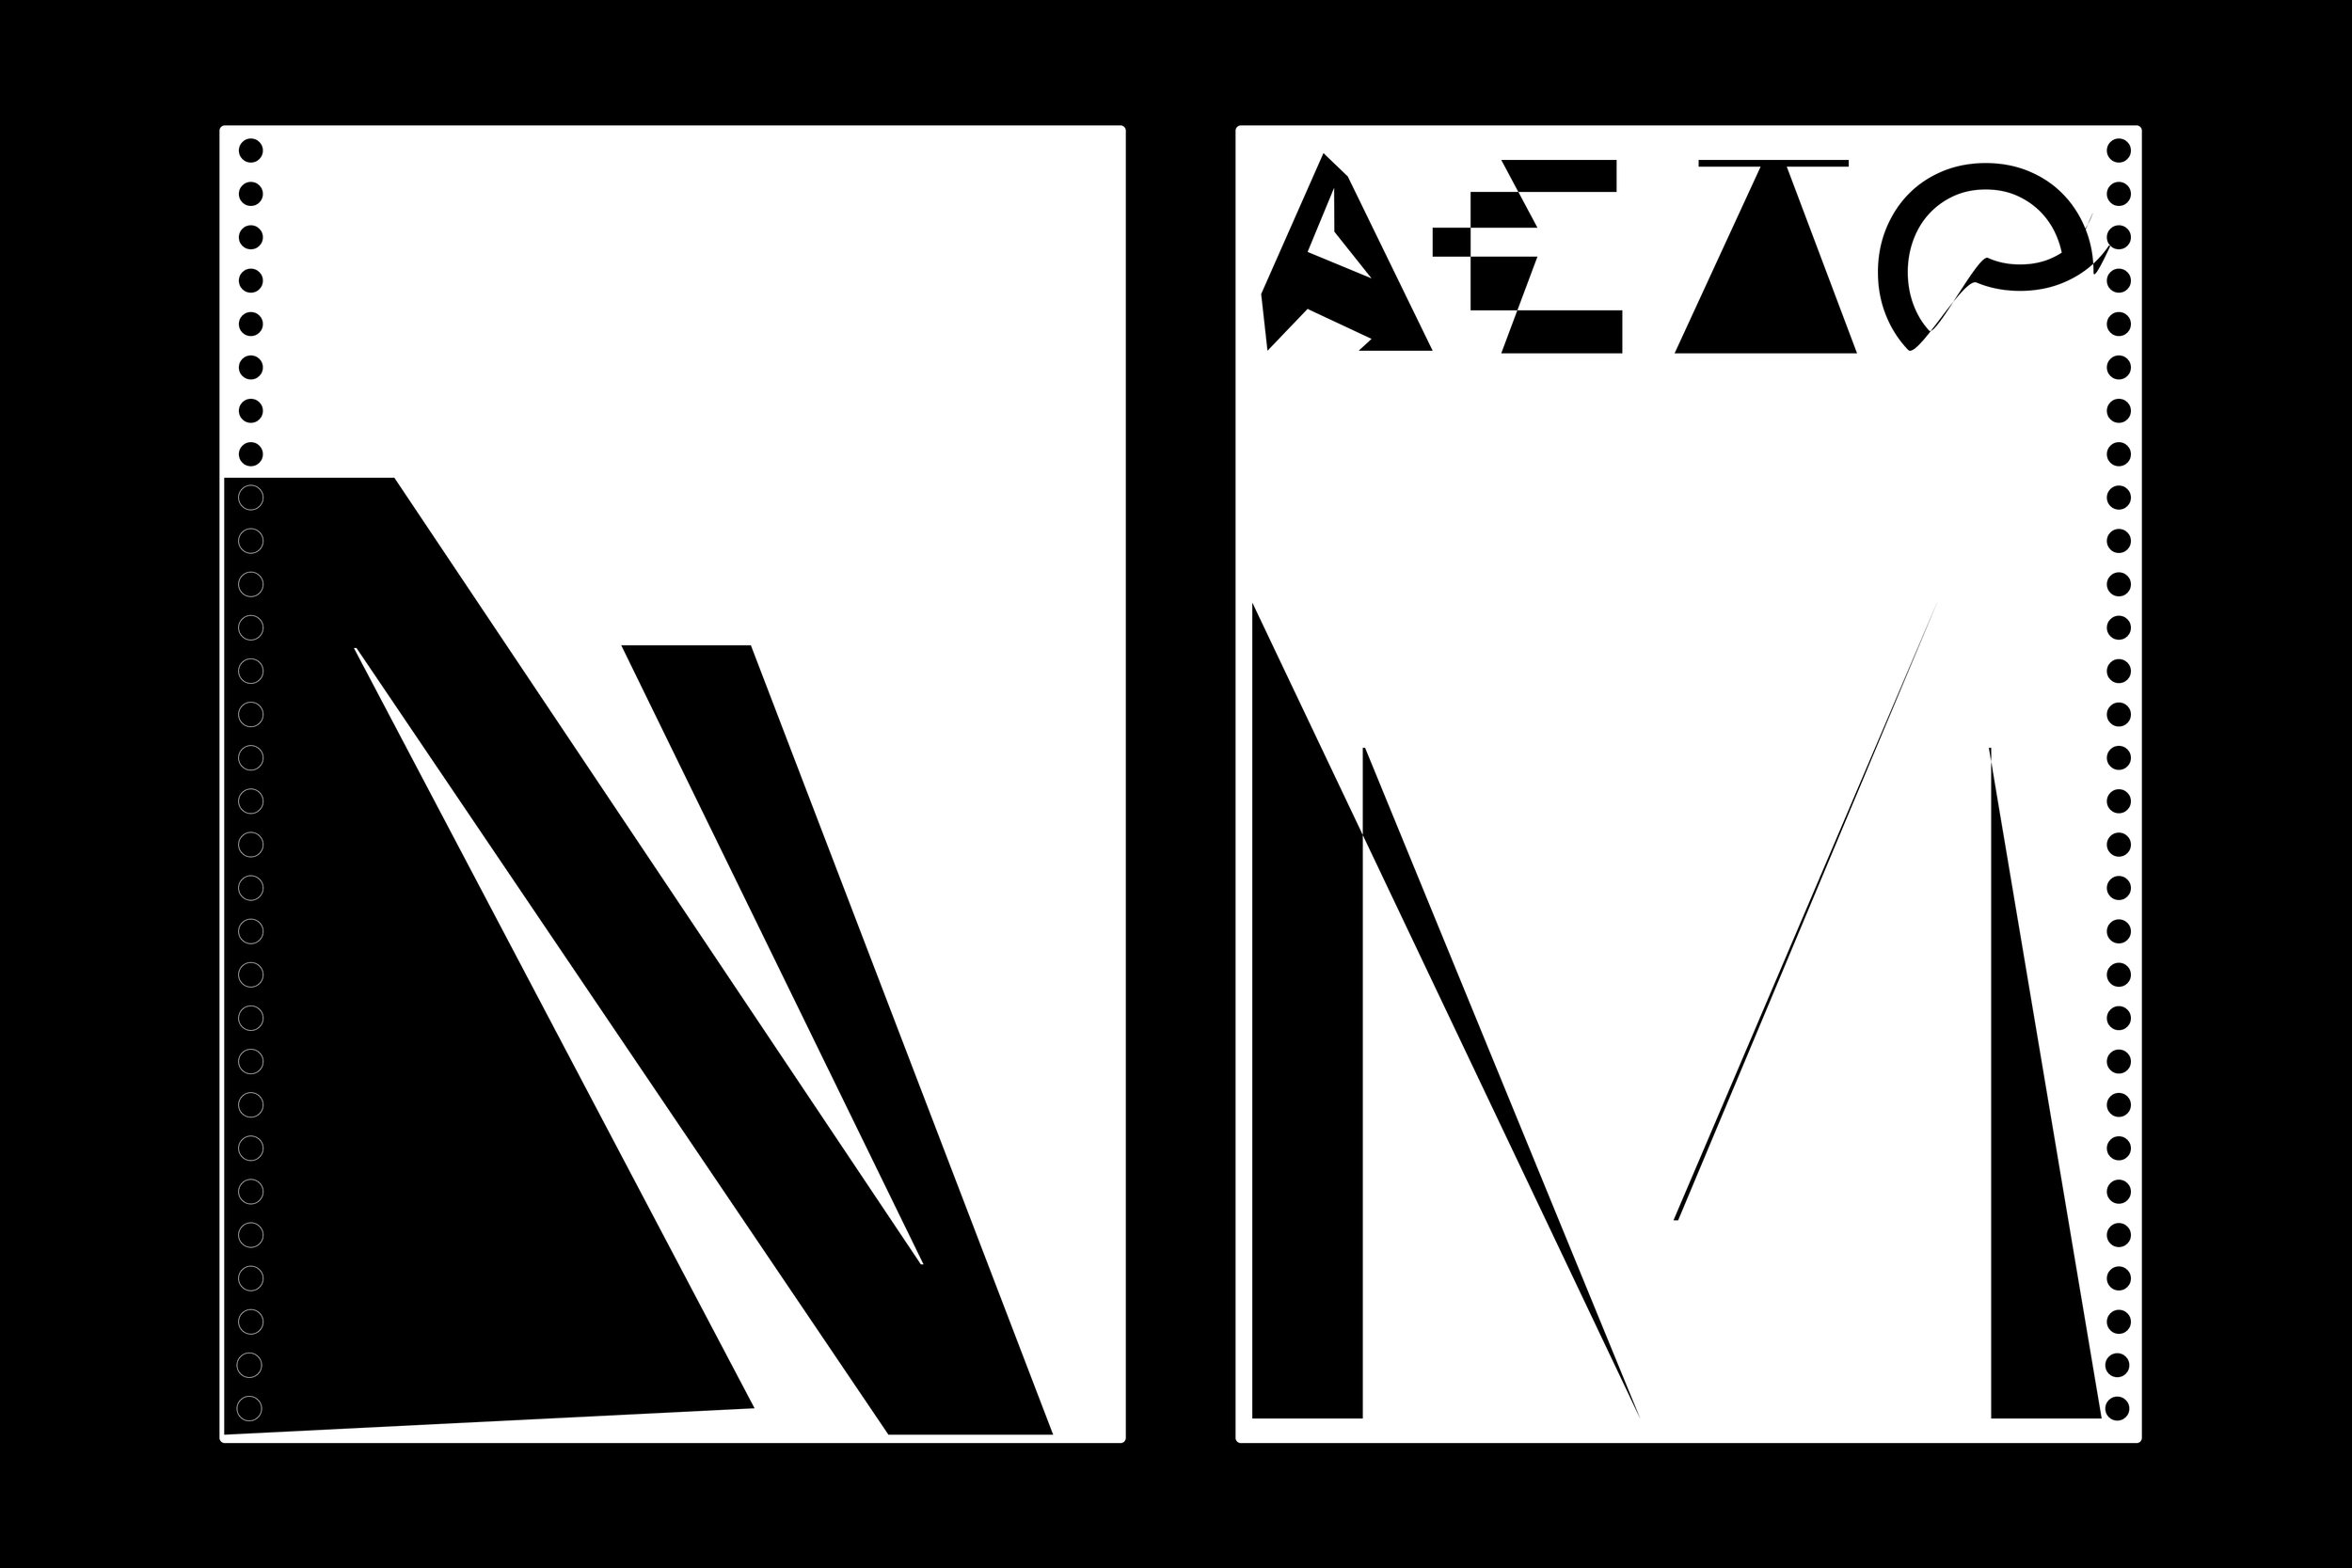 2019 - 930 letter variations - Myroslava Kuts + Florian Tripoteau | Creative Connections @ thecamp / Aix en Provence - 18.07.2019